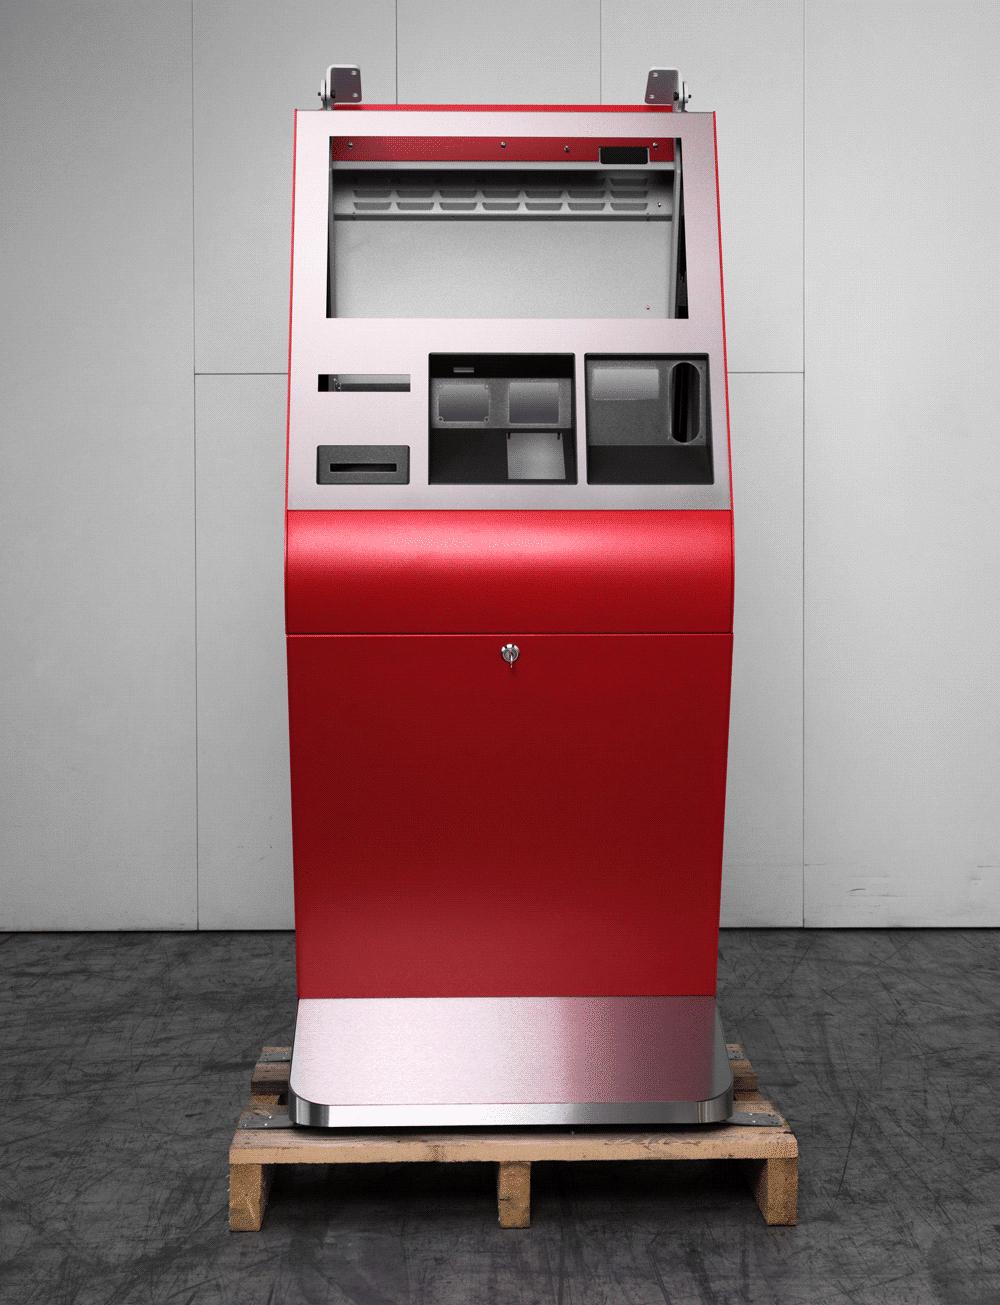 - Rotes Lotto Terminal © Jürgen Grünwald